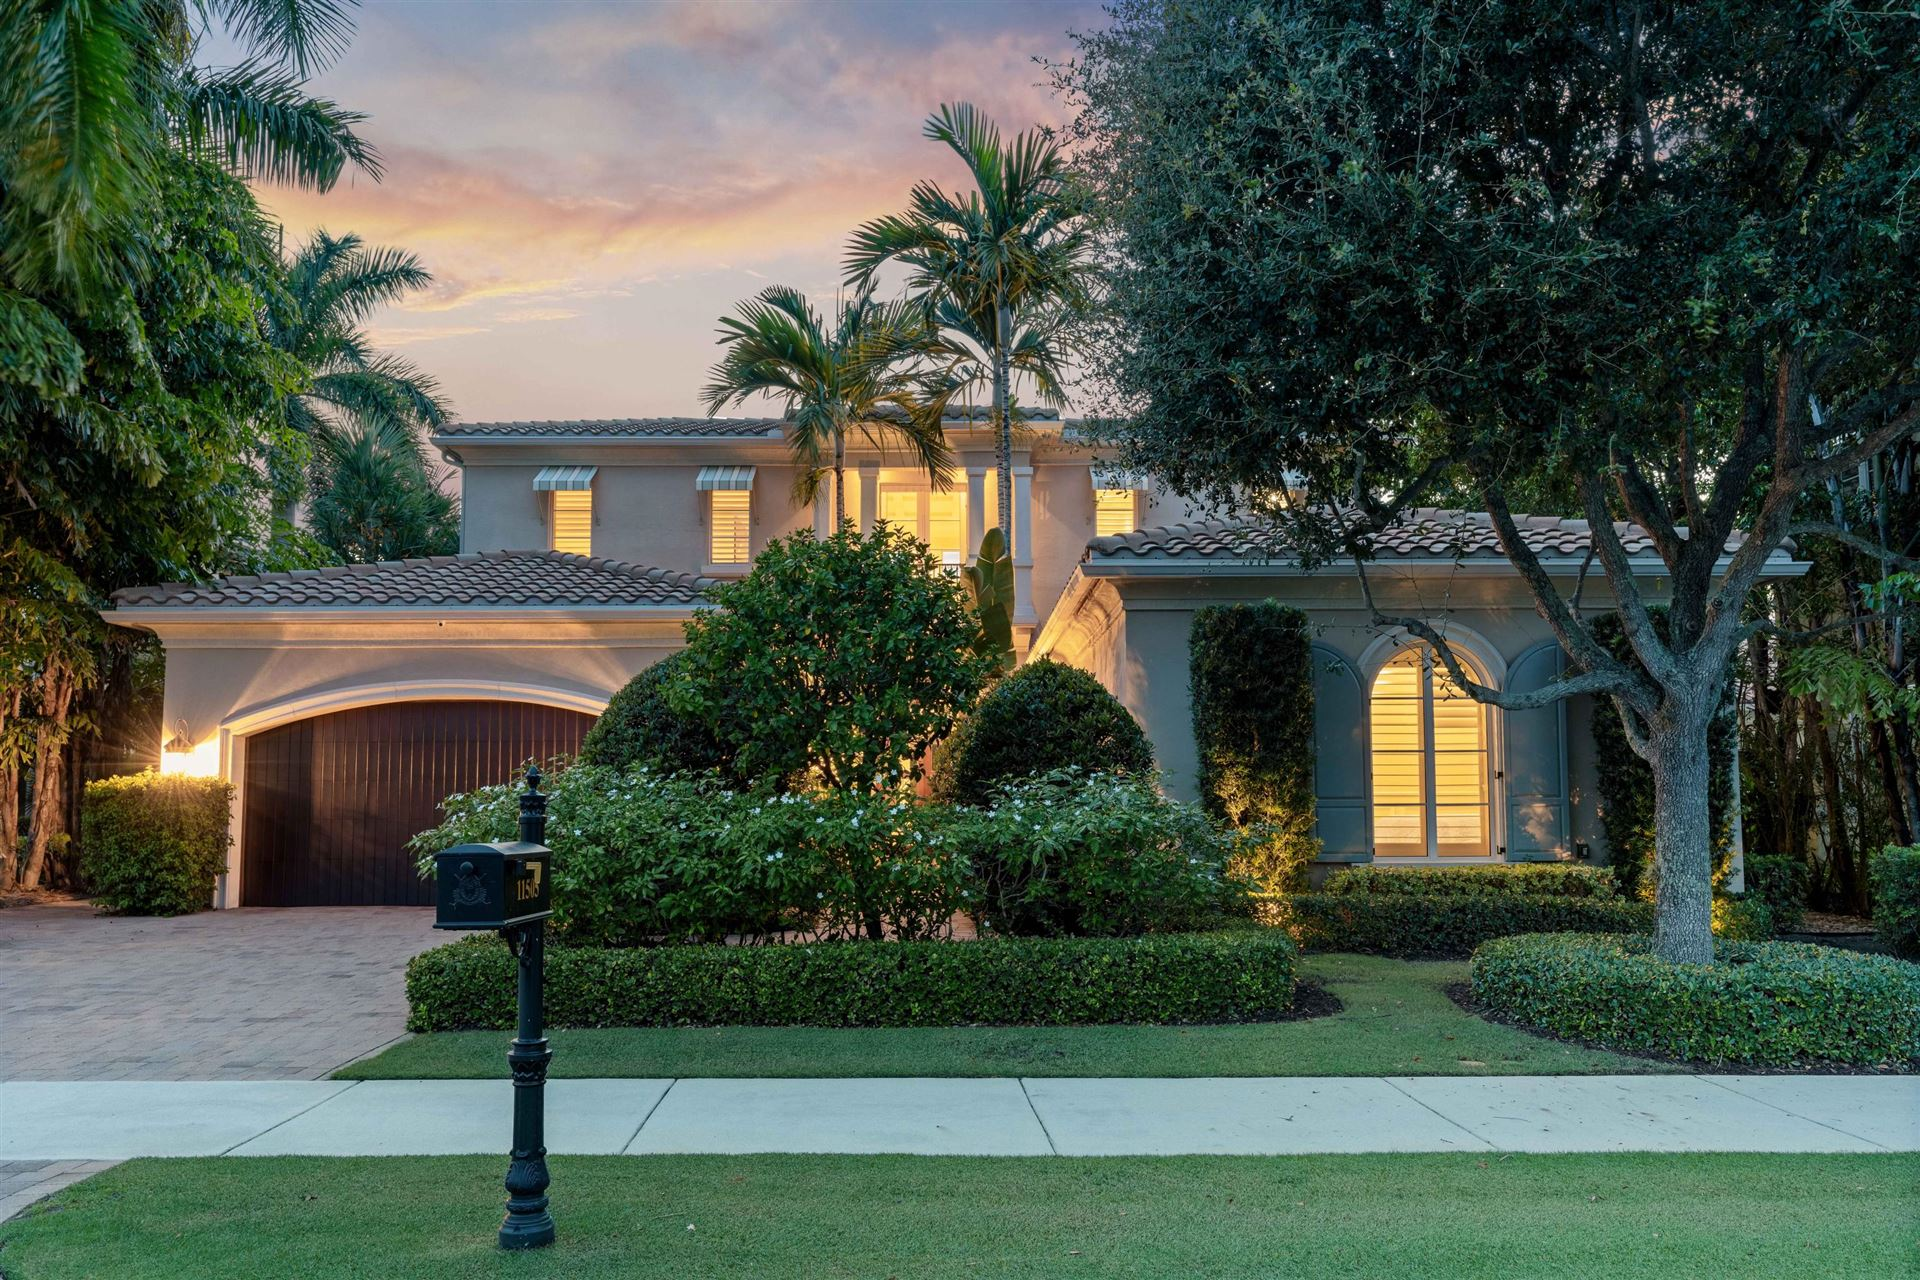 Photo of 11505 Green Bayberry Drive, Palm Beach Gardens, FL 33418 (MLS # RX-10651551)